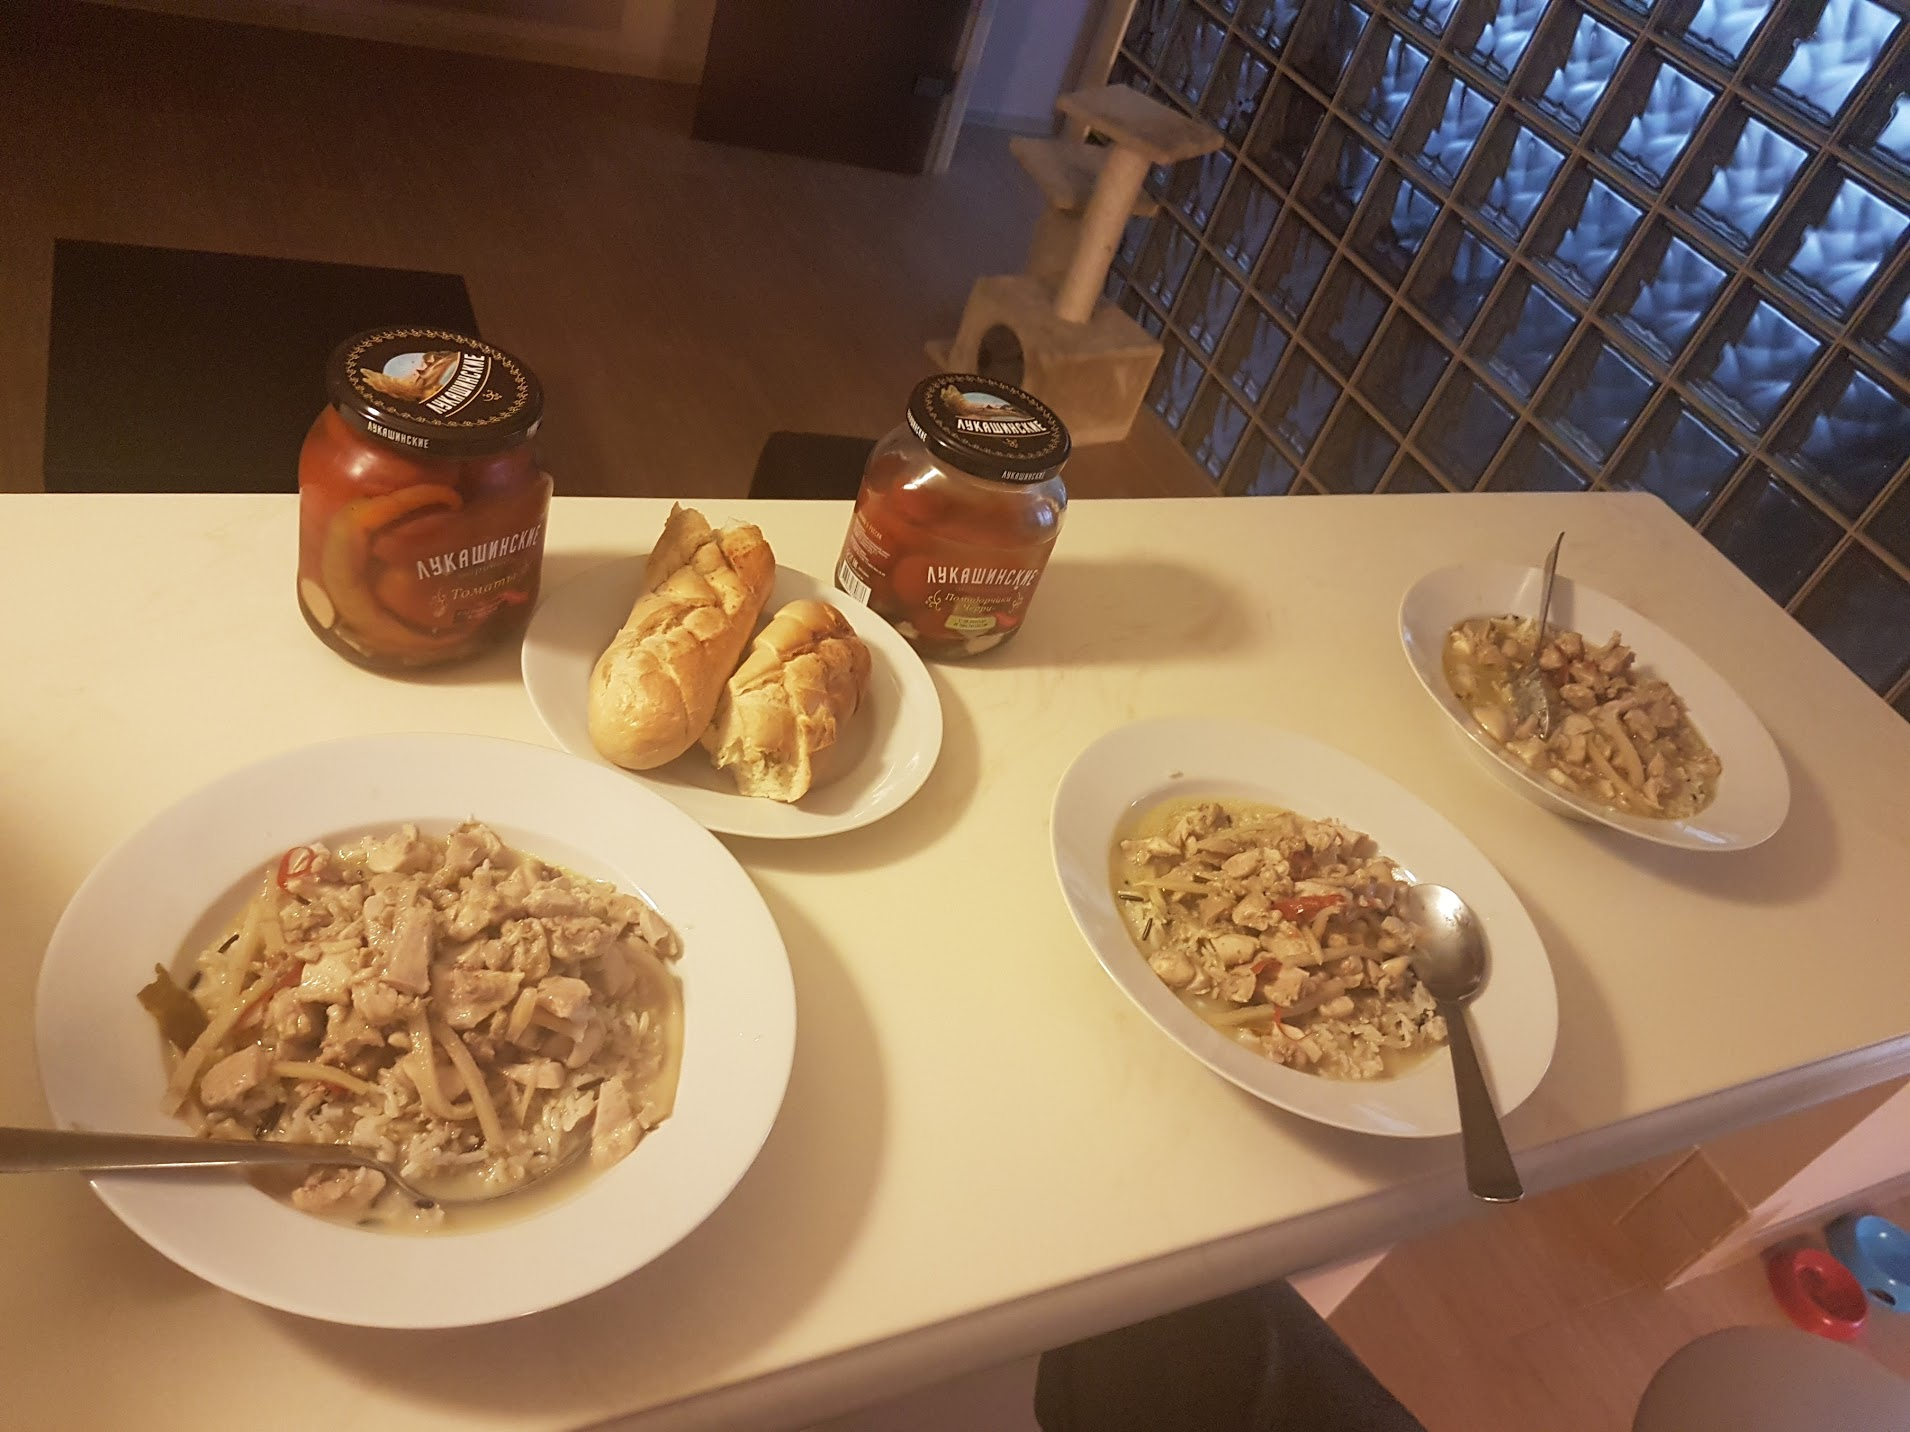 Bongo RD and Iconjob productivity food